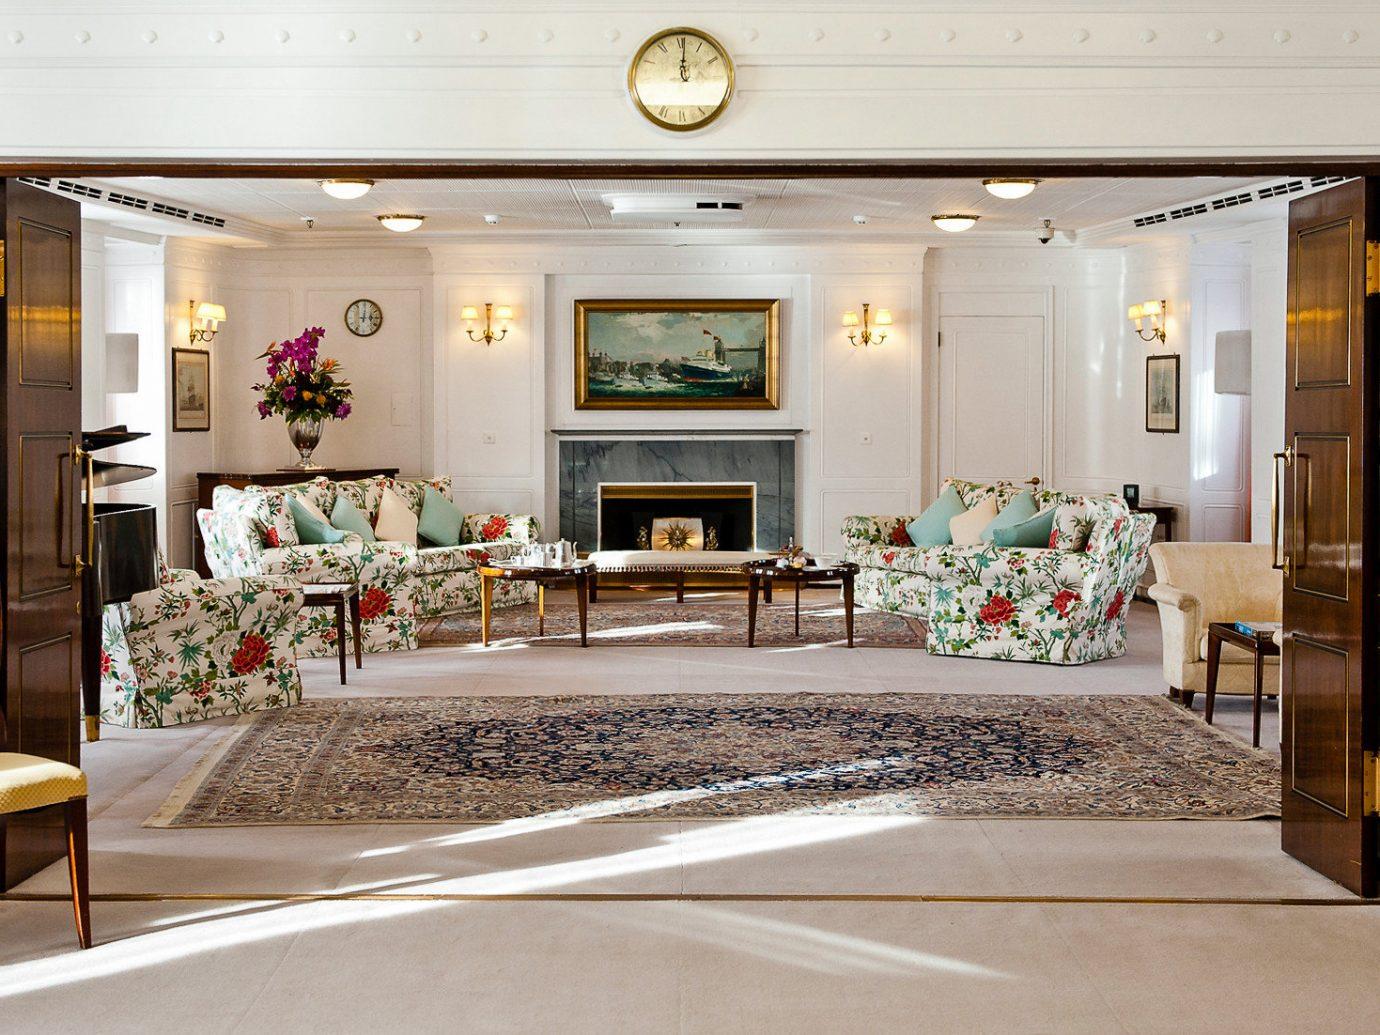 Edinburgh Hotels Jetsetter Guides Scotland Travel Tips Trip Ideas Lobby room interior design living room furniture function hall flooring home ceiling